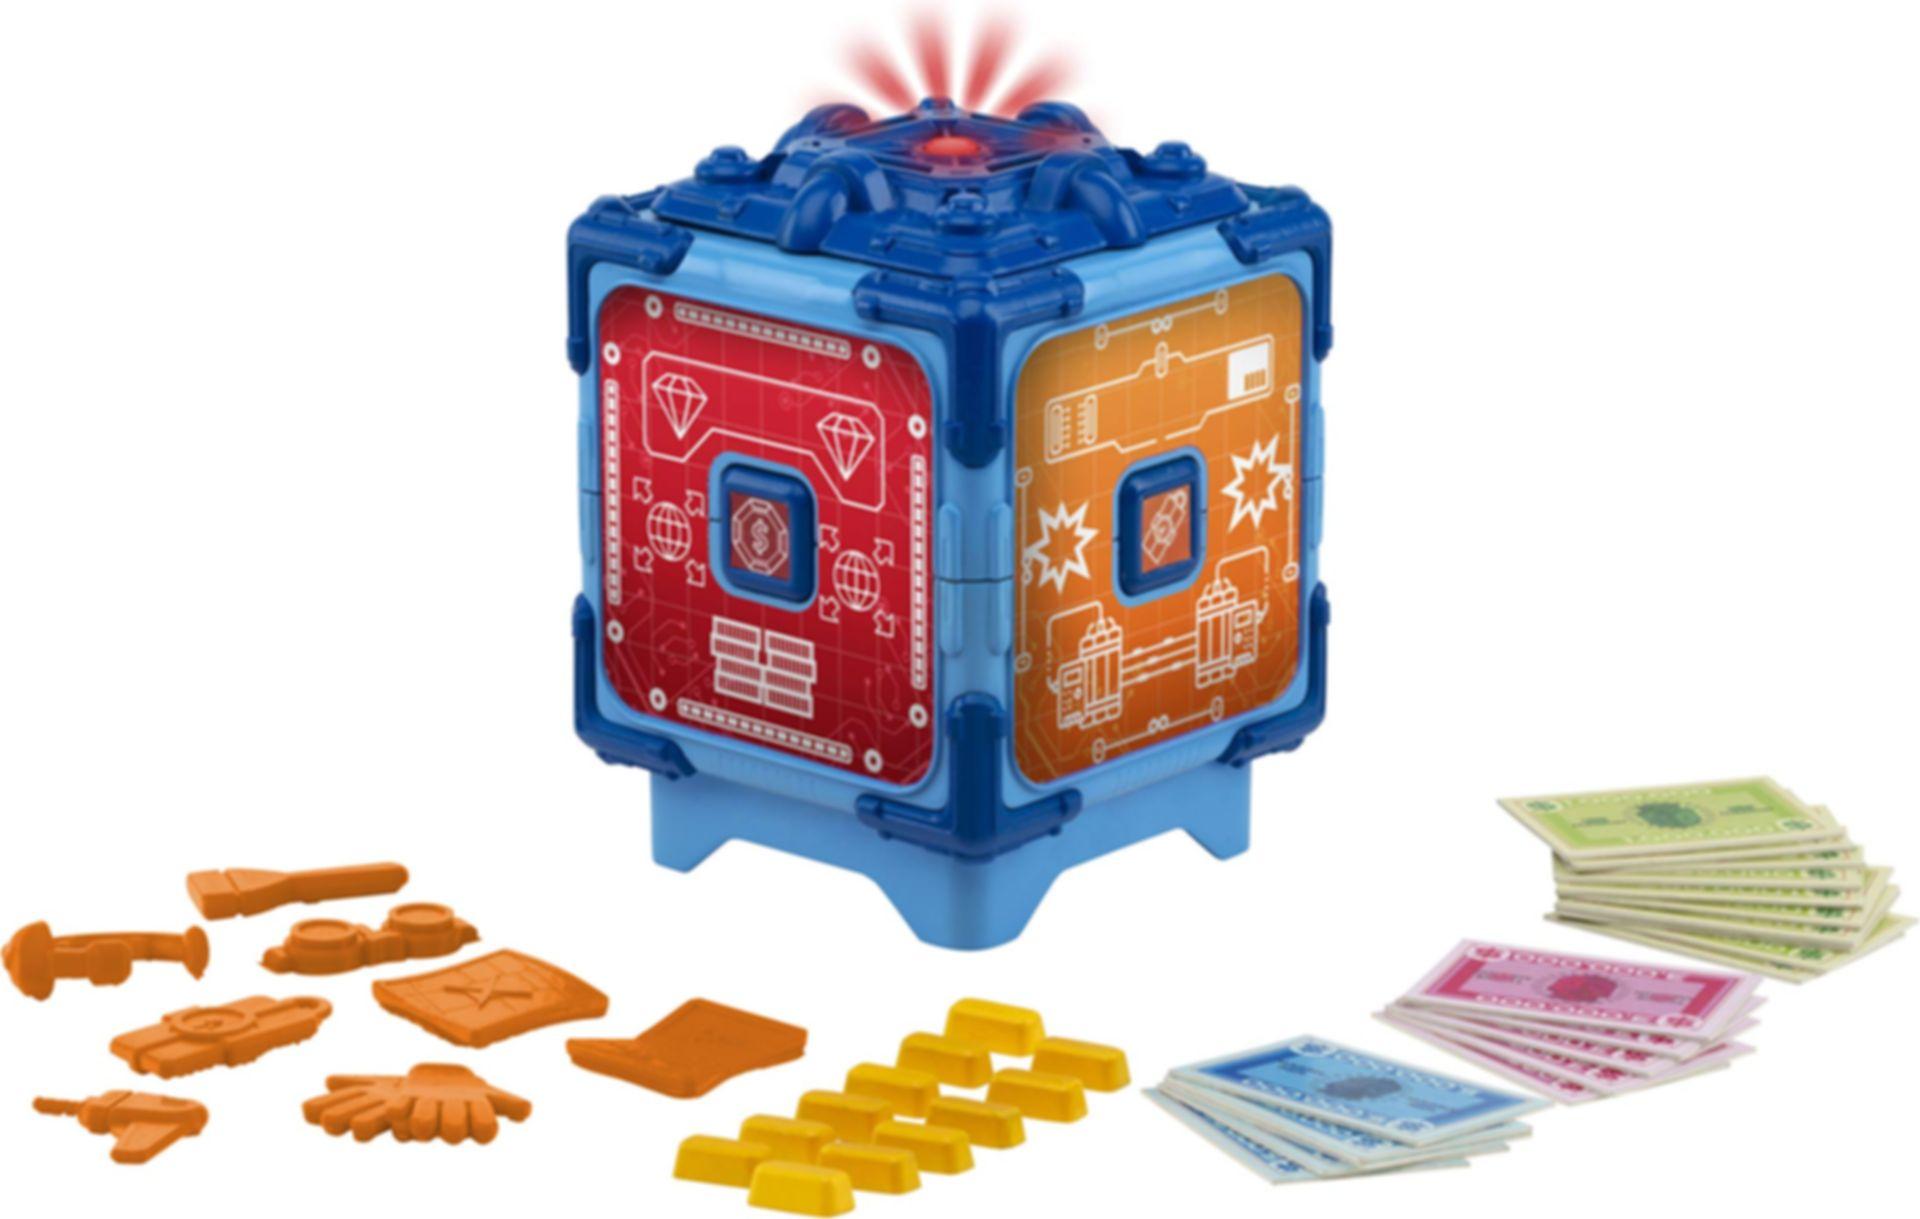 Bank Attack components